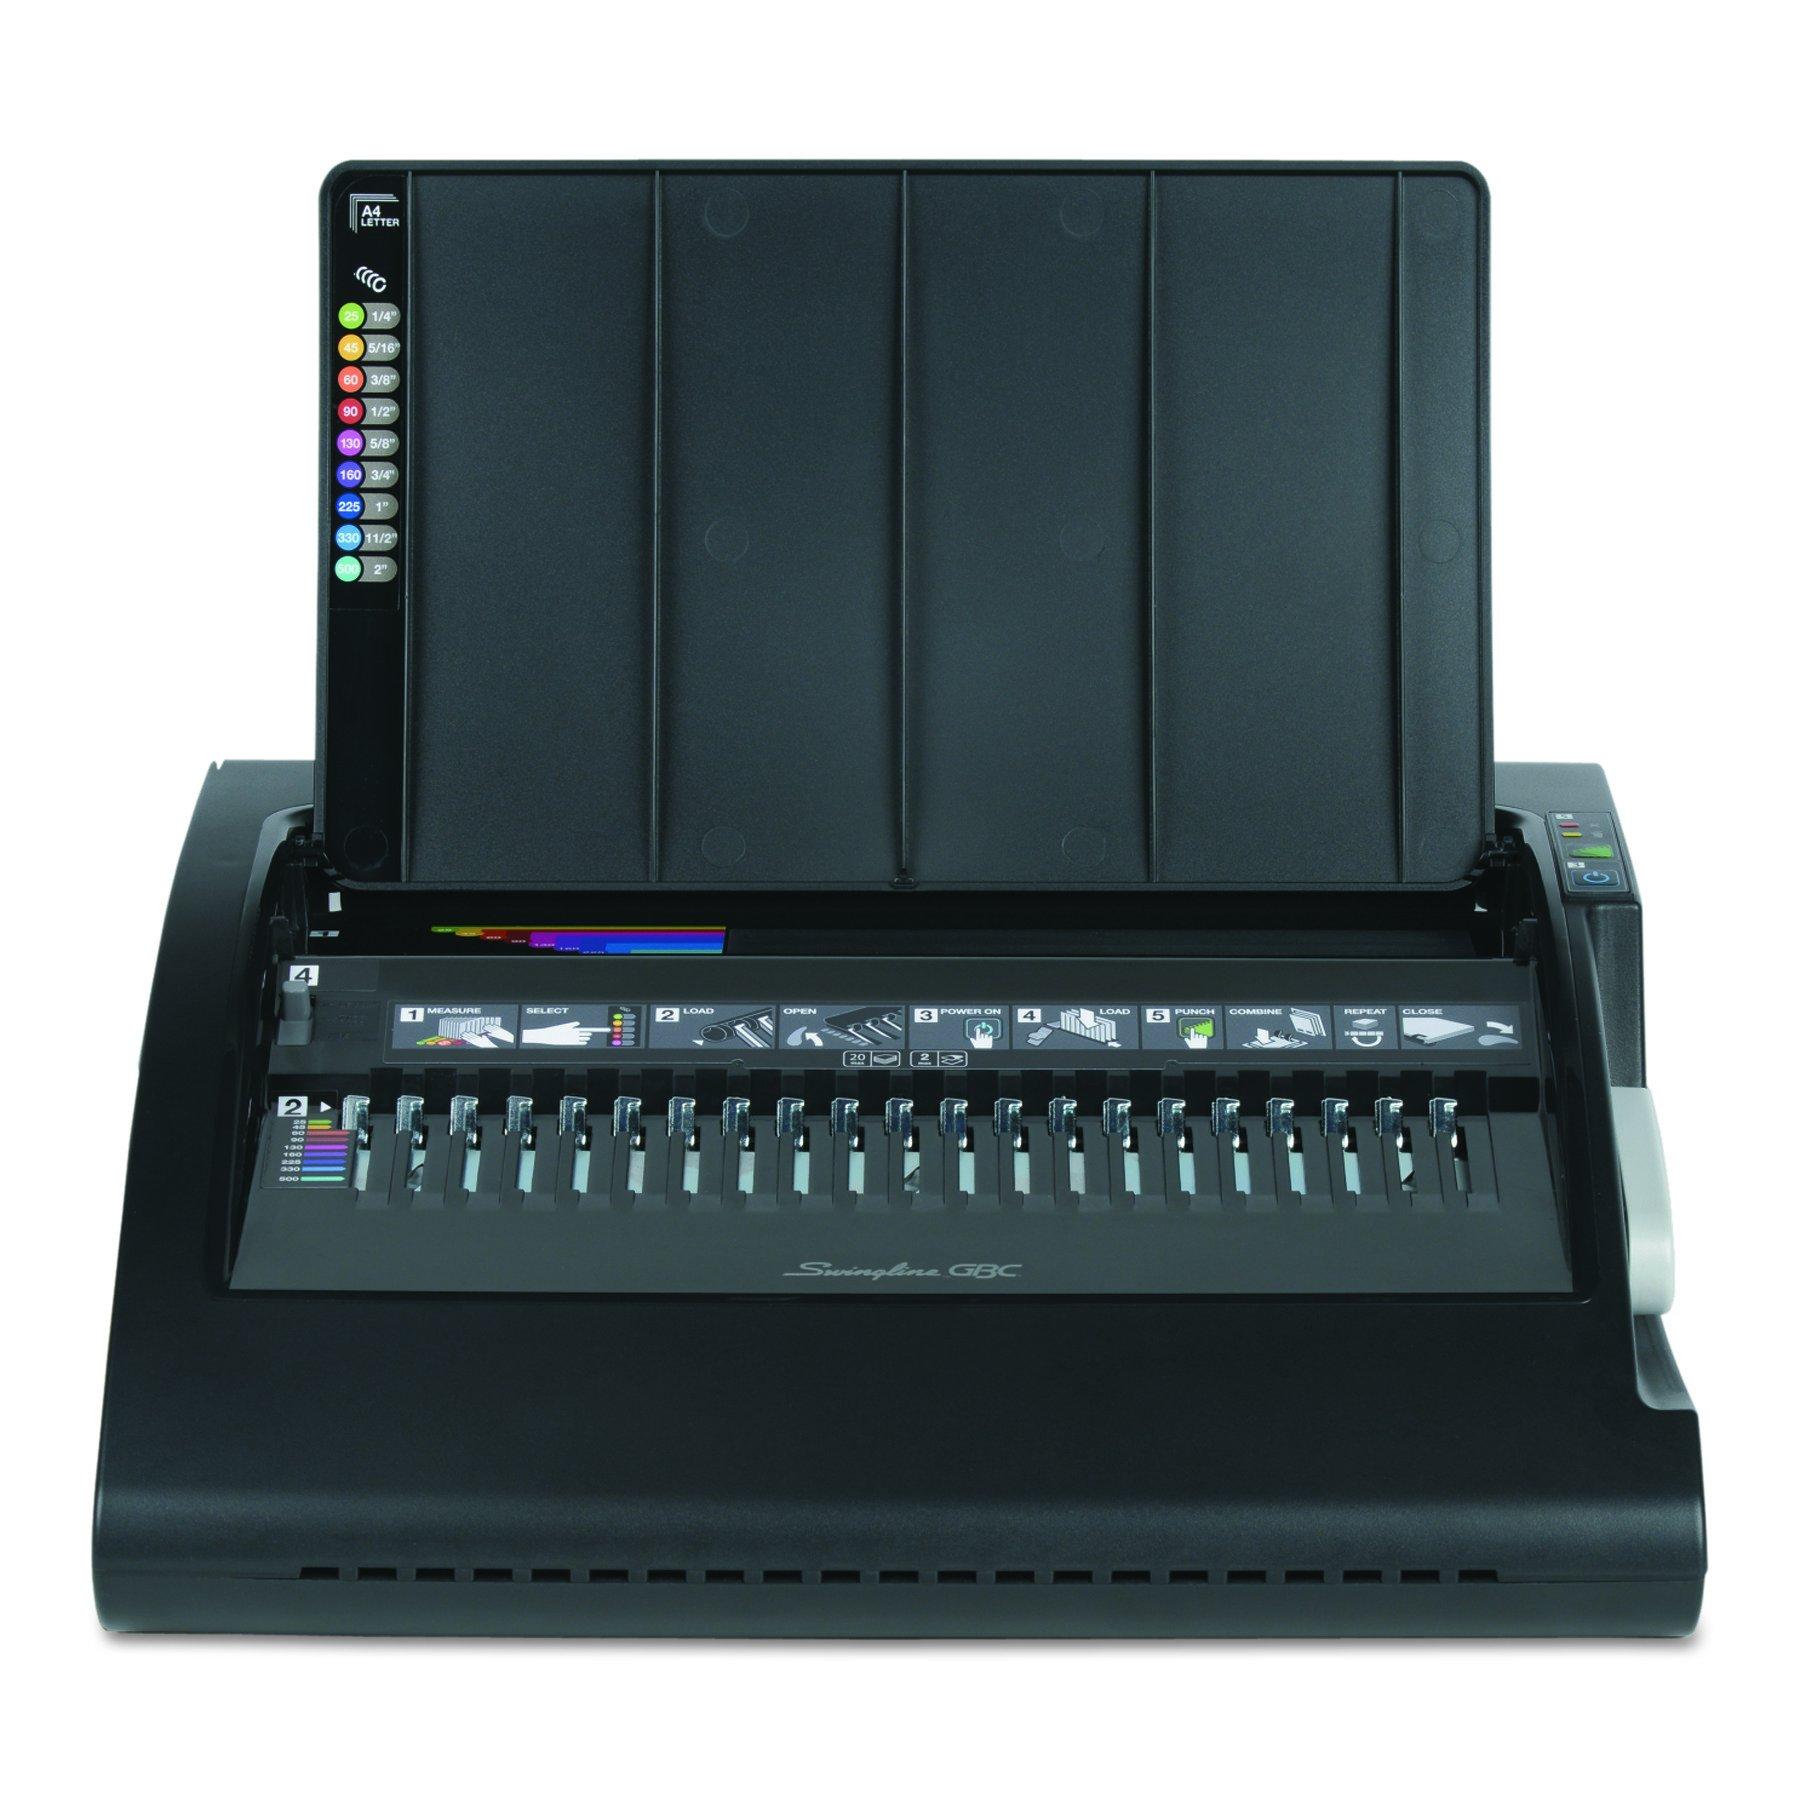 Swingline GBC 7708175 CombBind C210E Electric Binding Machine, Binds 330, Punches 20, Black